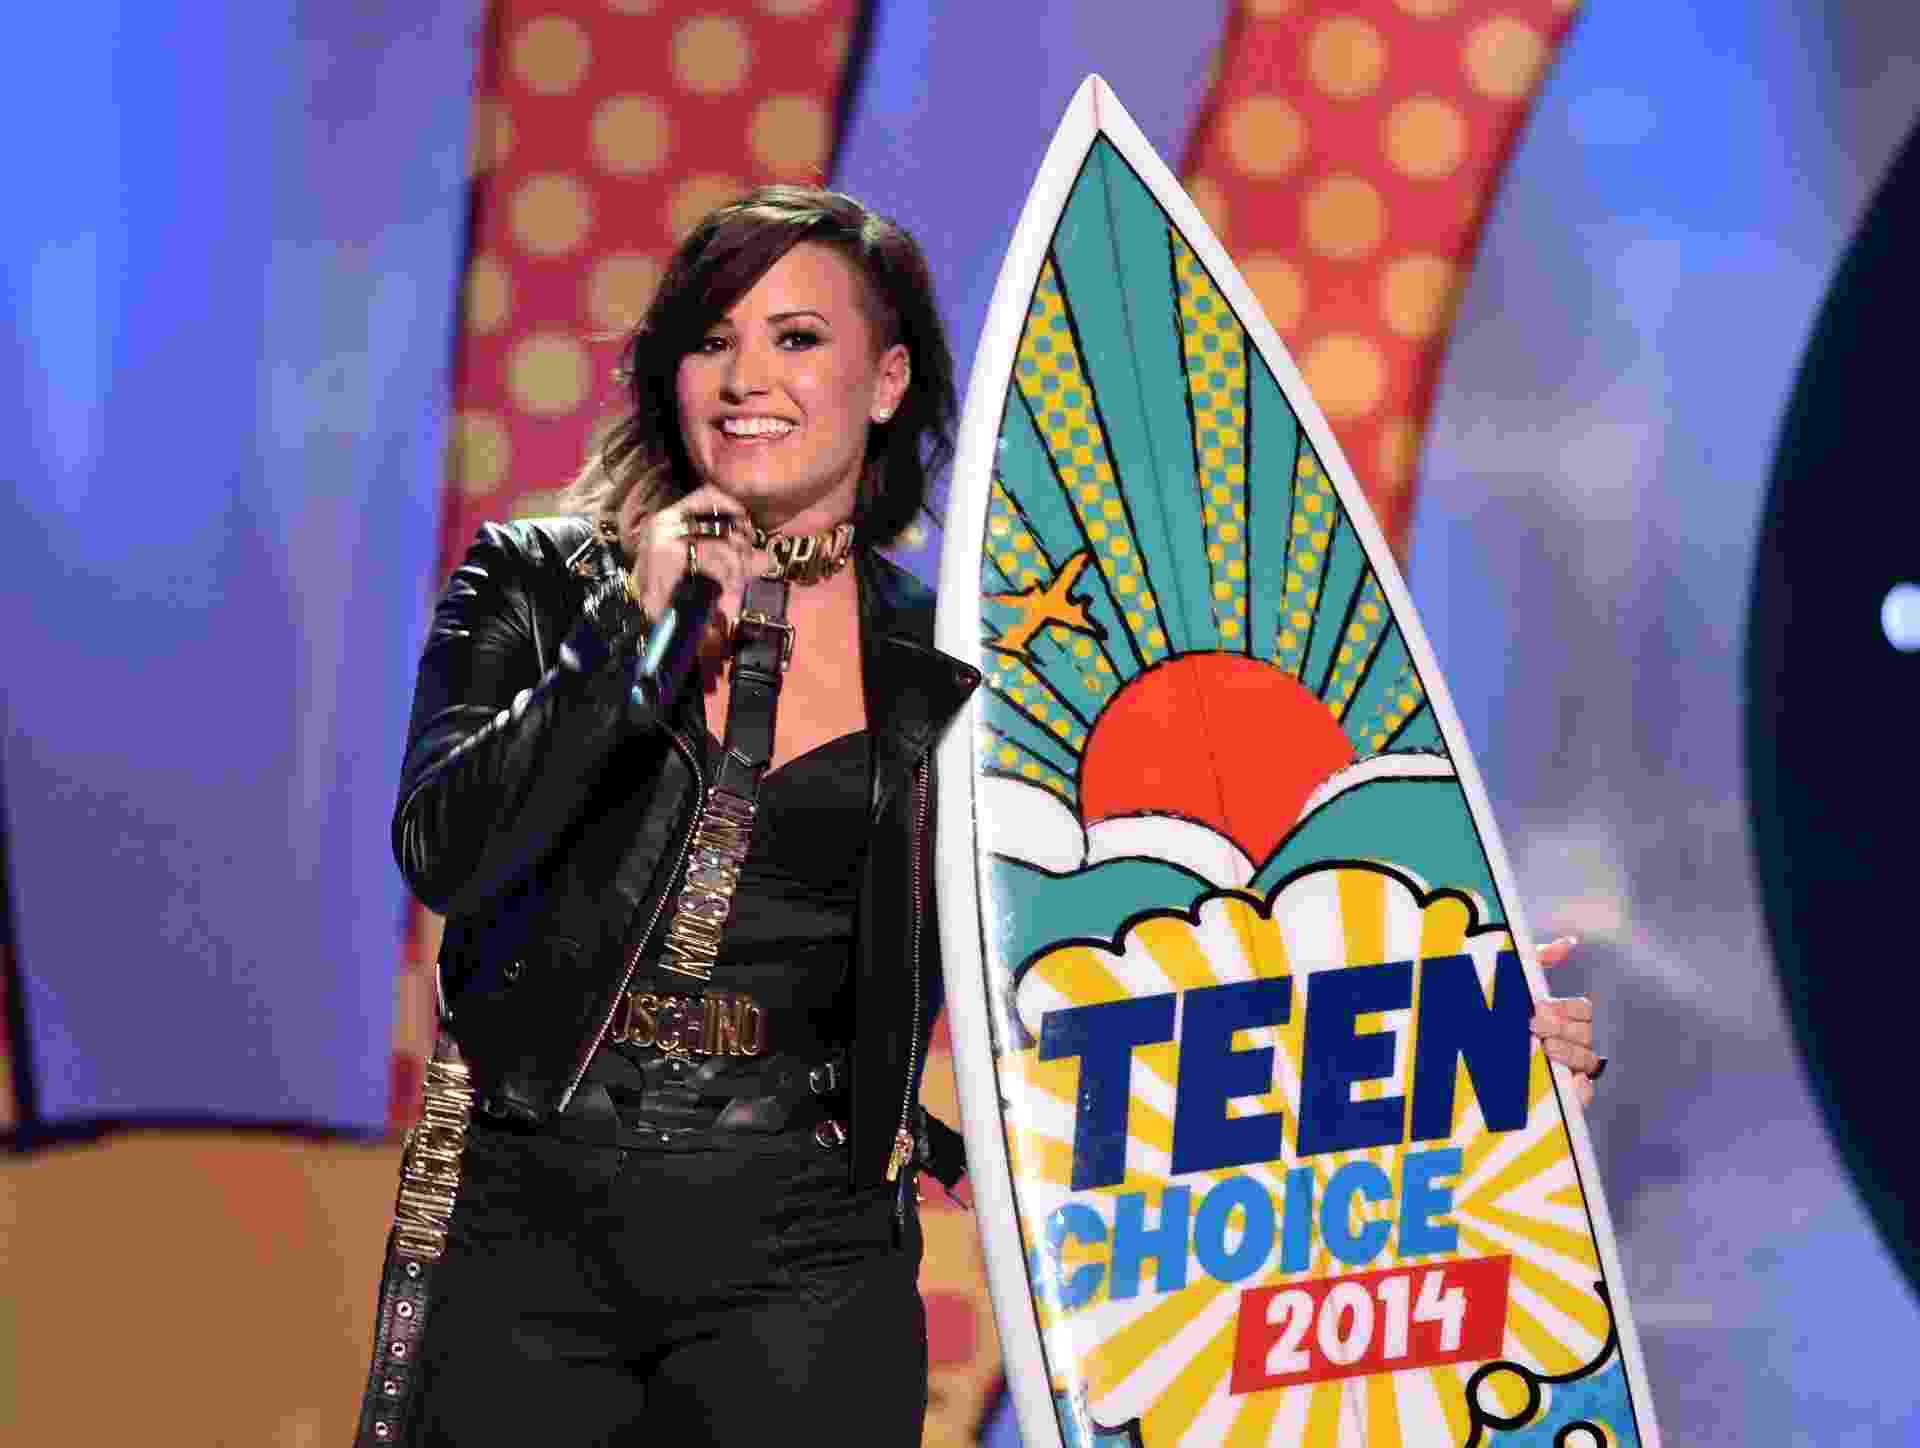 10.ago.2014 - Demi Lovato leva prêmio no Teen Choice Awards, onde também se apresentou na noite deste domingo - Kevin Winter/Getty Images/AFP